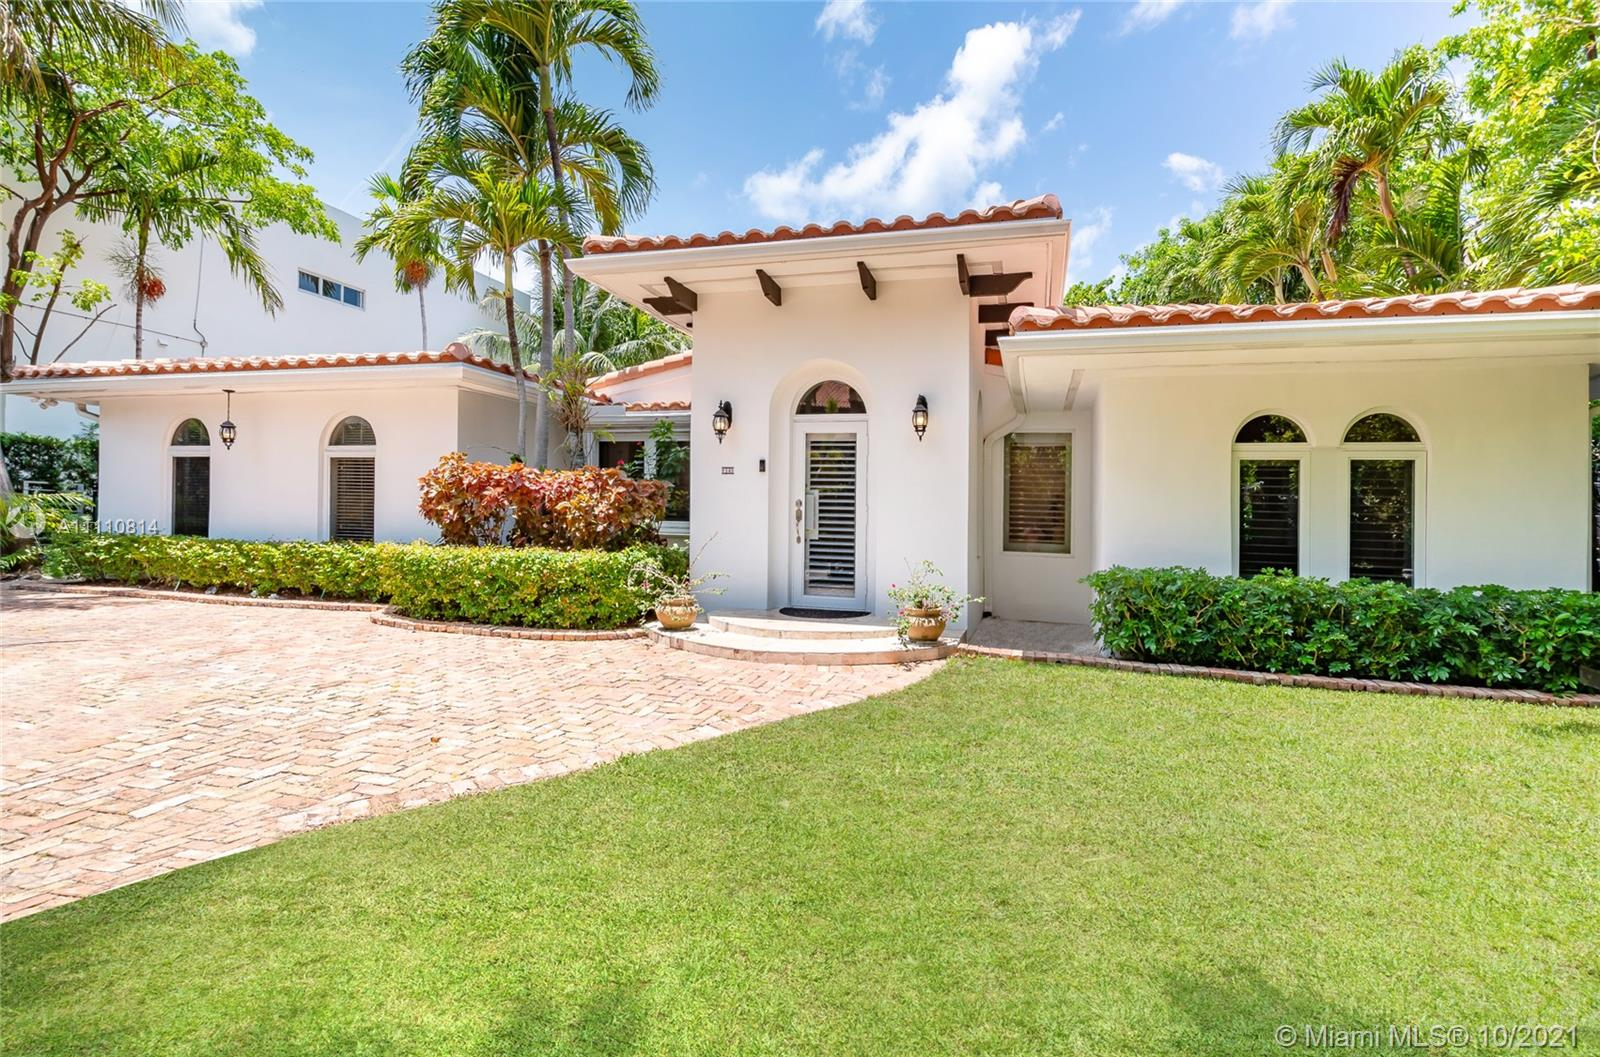 145 Hampton Ln, Key Biscayne, Florida 33149